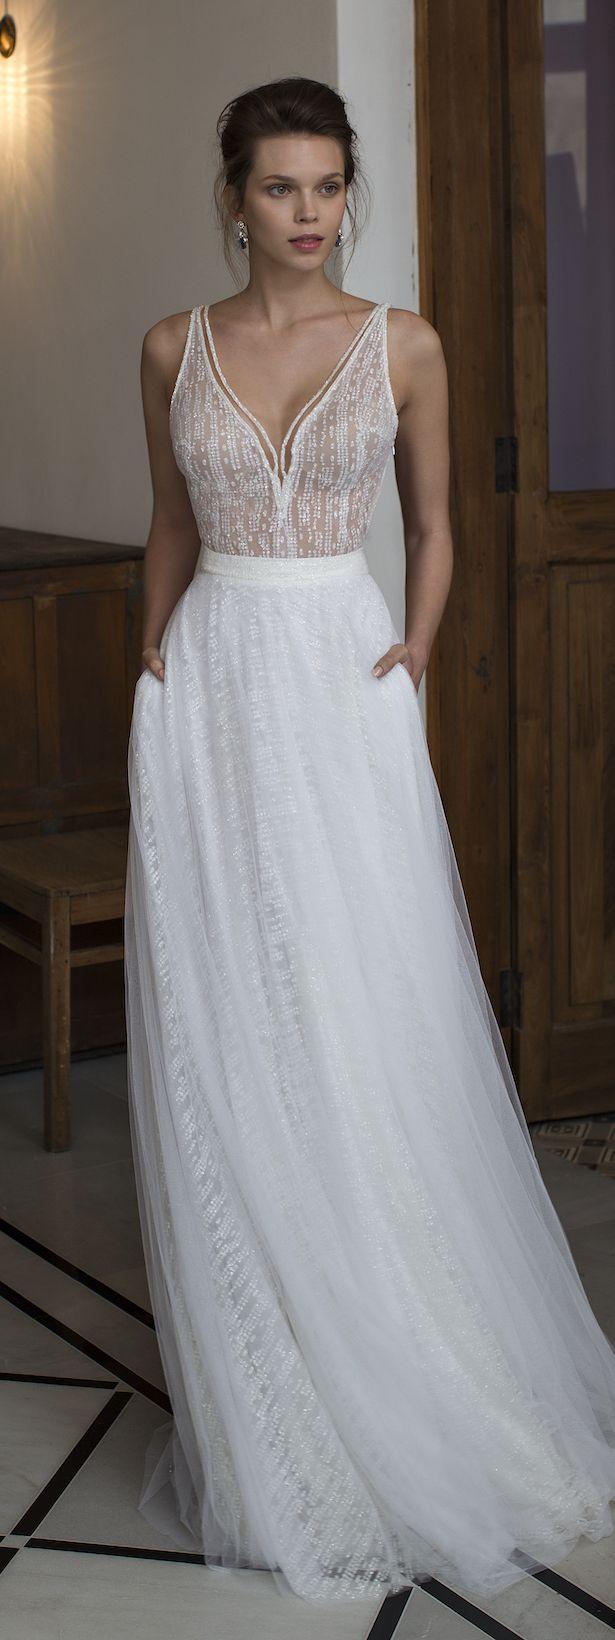 973 best Wedding dresses/ ideas images on Pinterest | Engagements ...